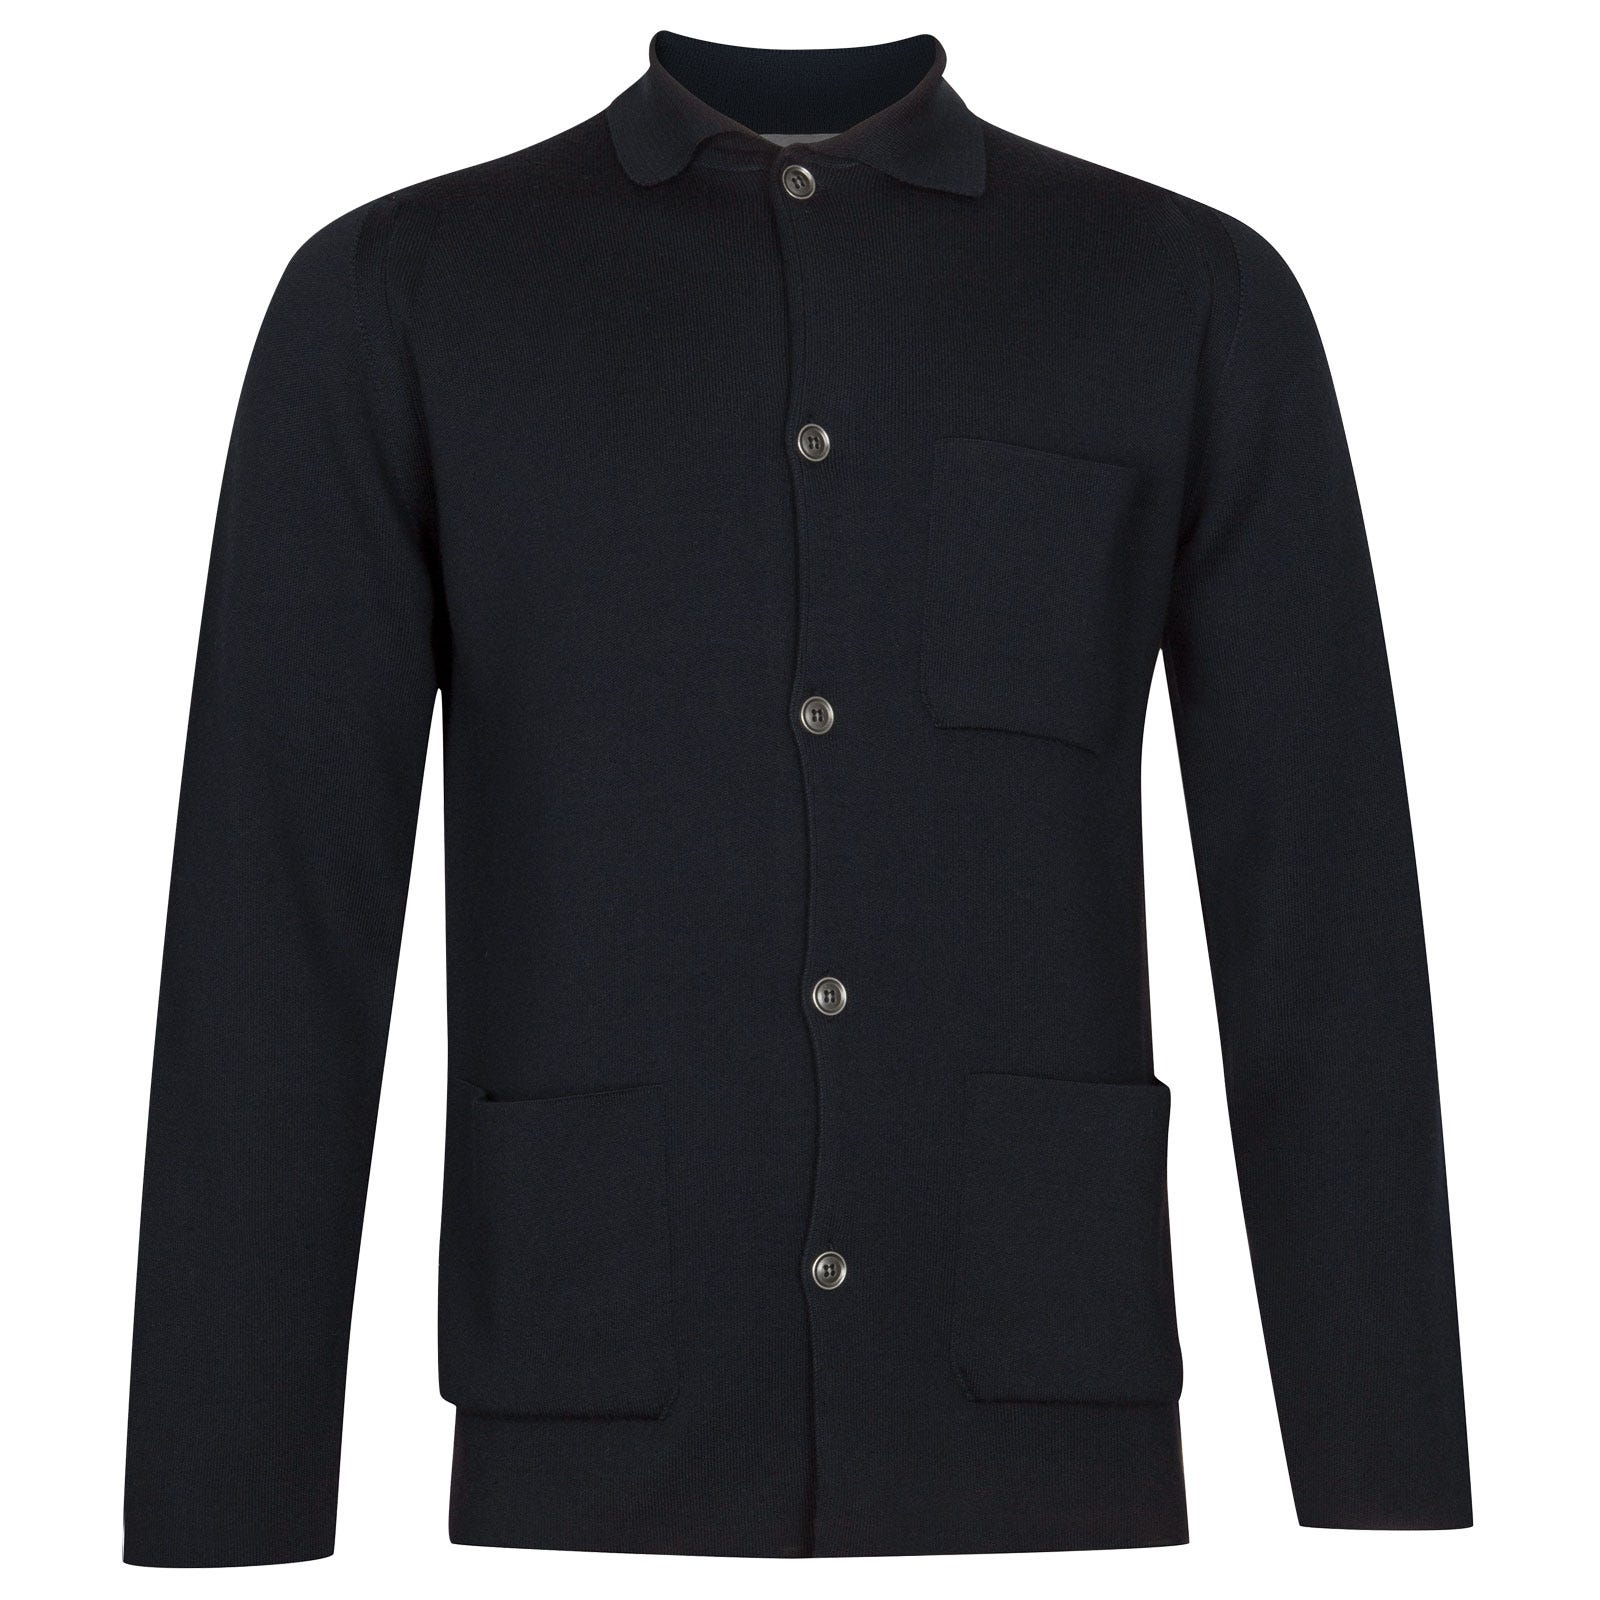 John Smedley Copper Merino Wool Jacket in Midnight-XL